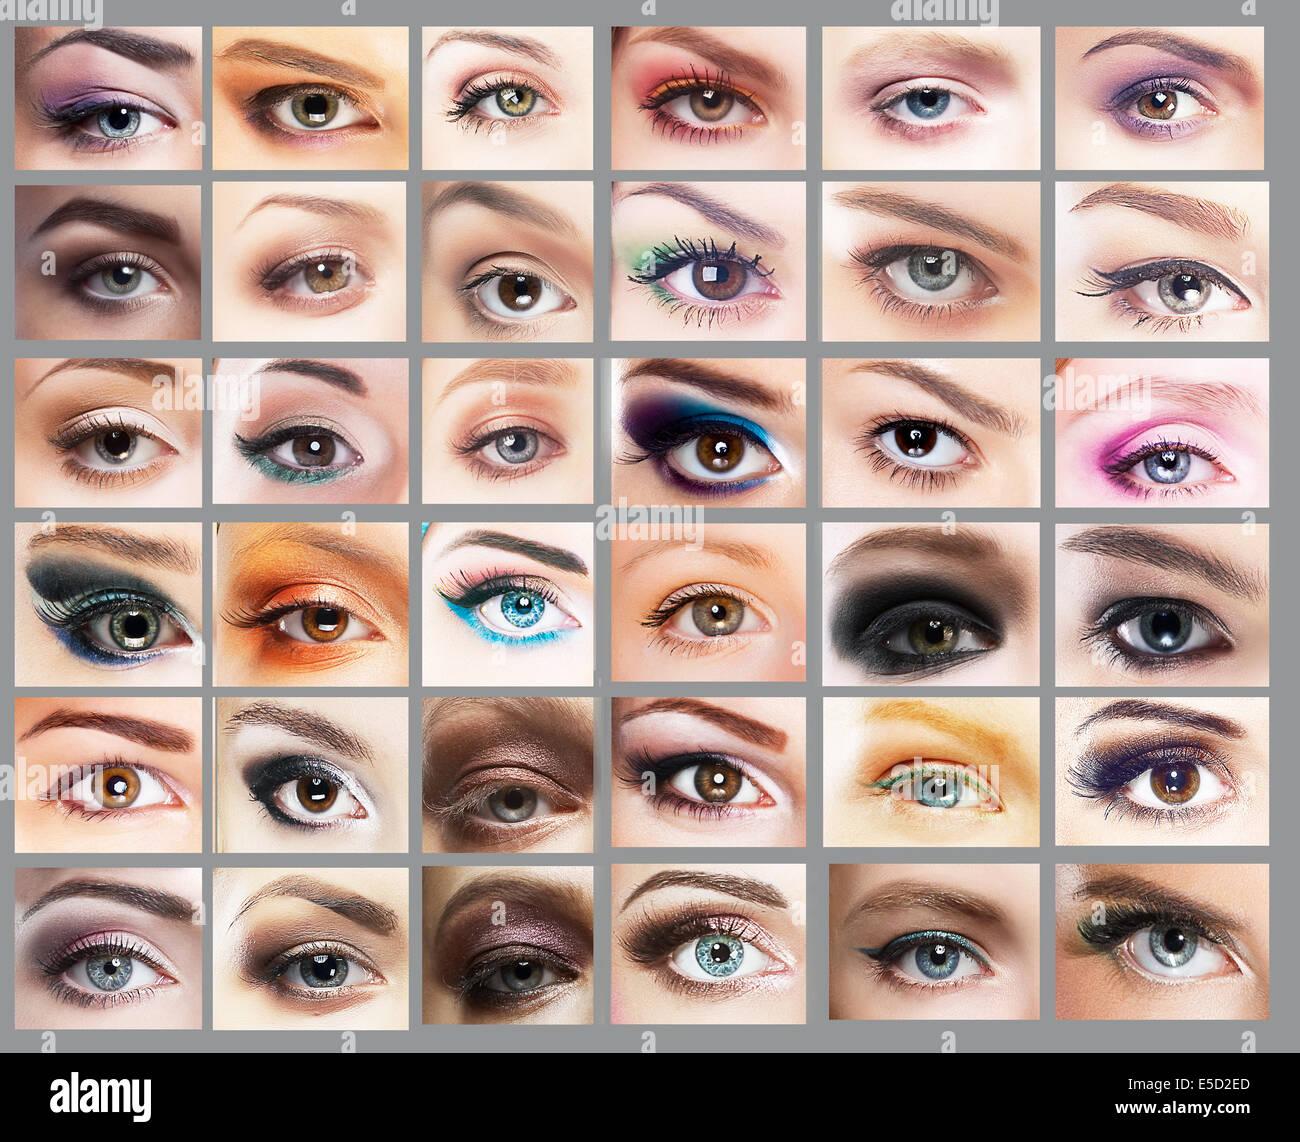 Mascara. Great Variety of Women's Eyes. Set of Eyeshadow - Stock Image